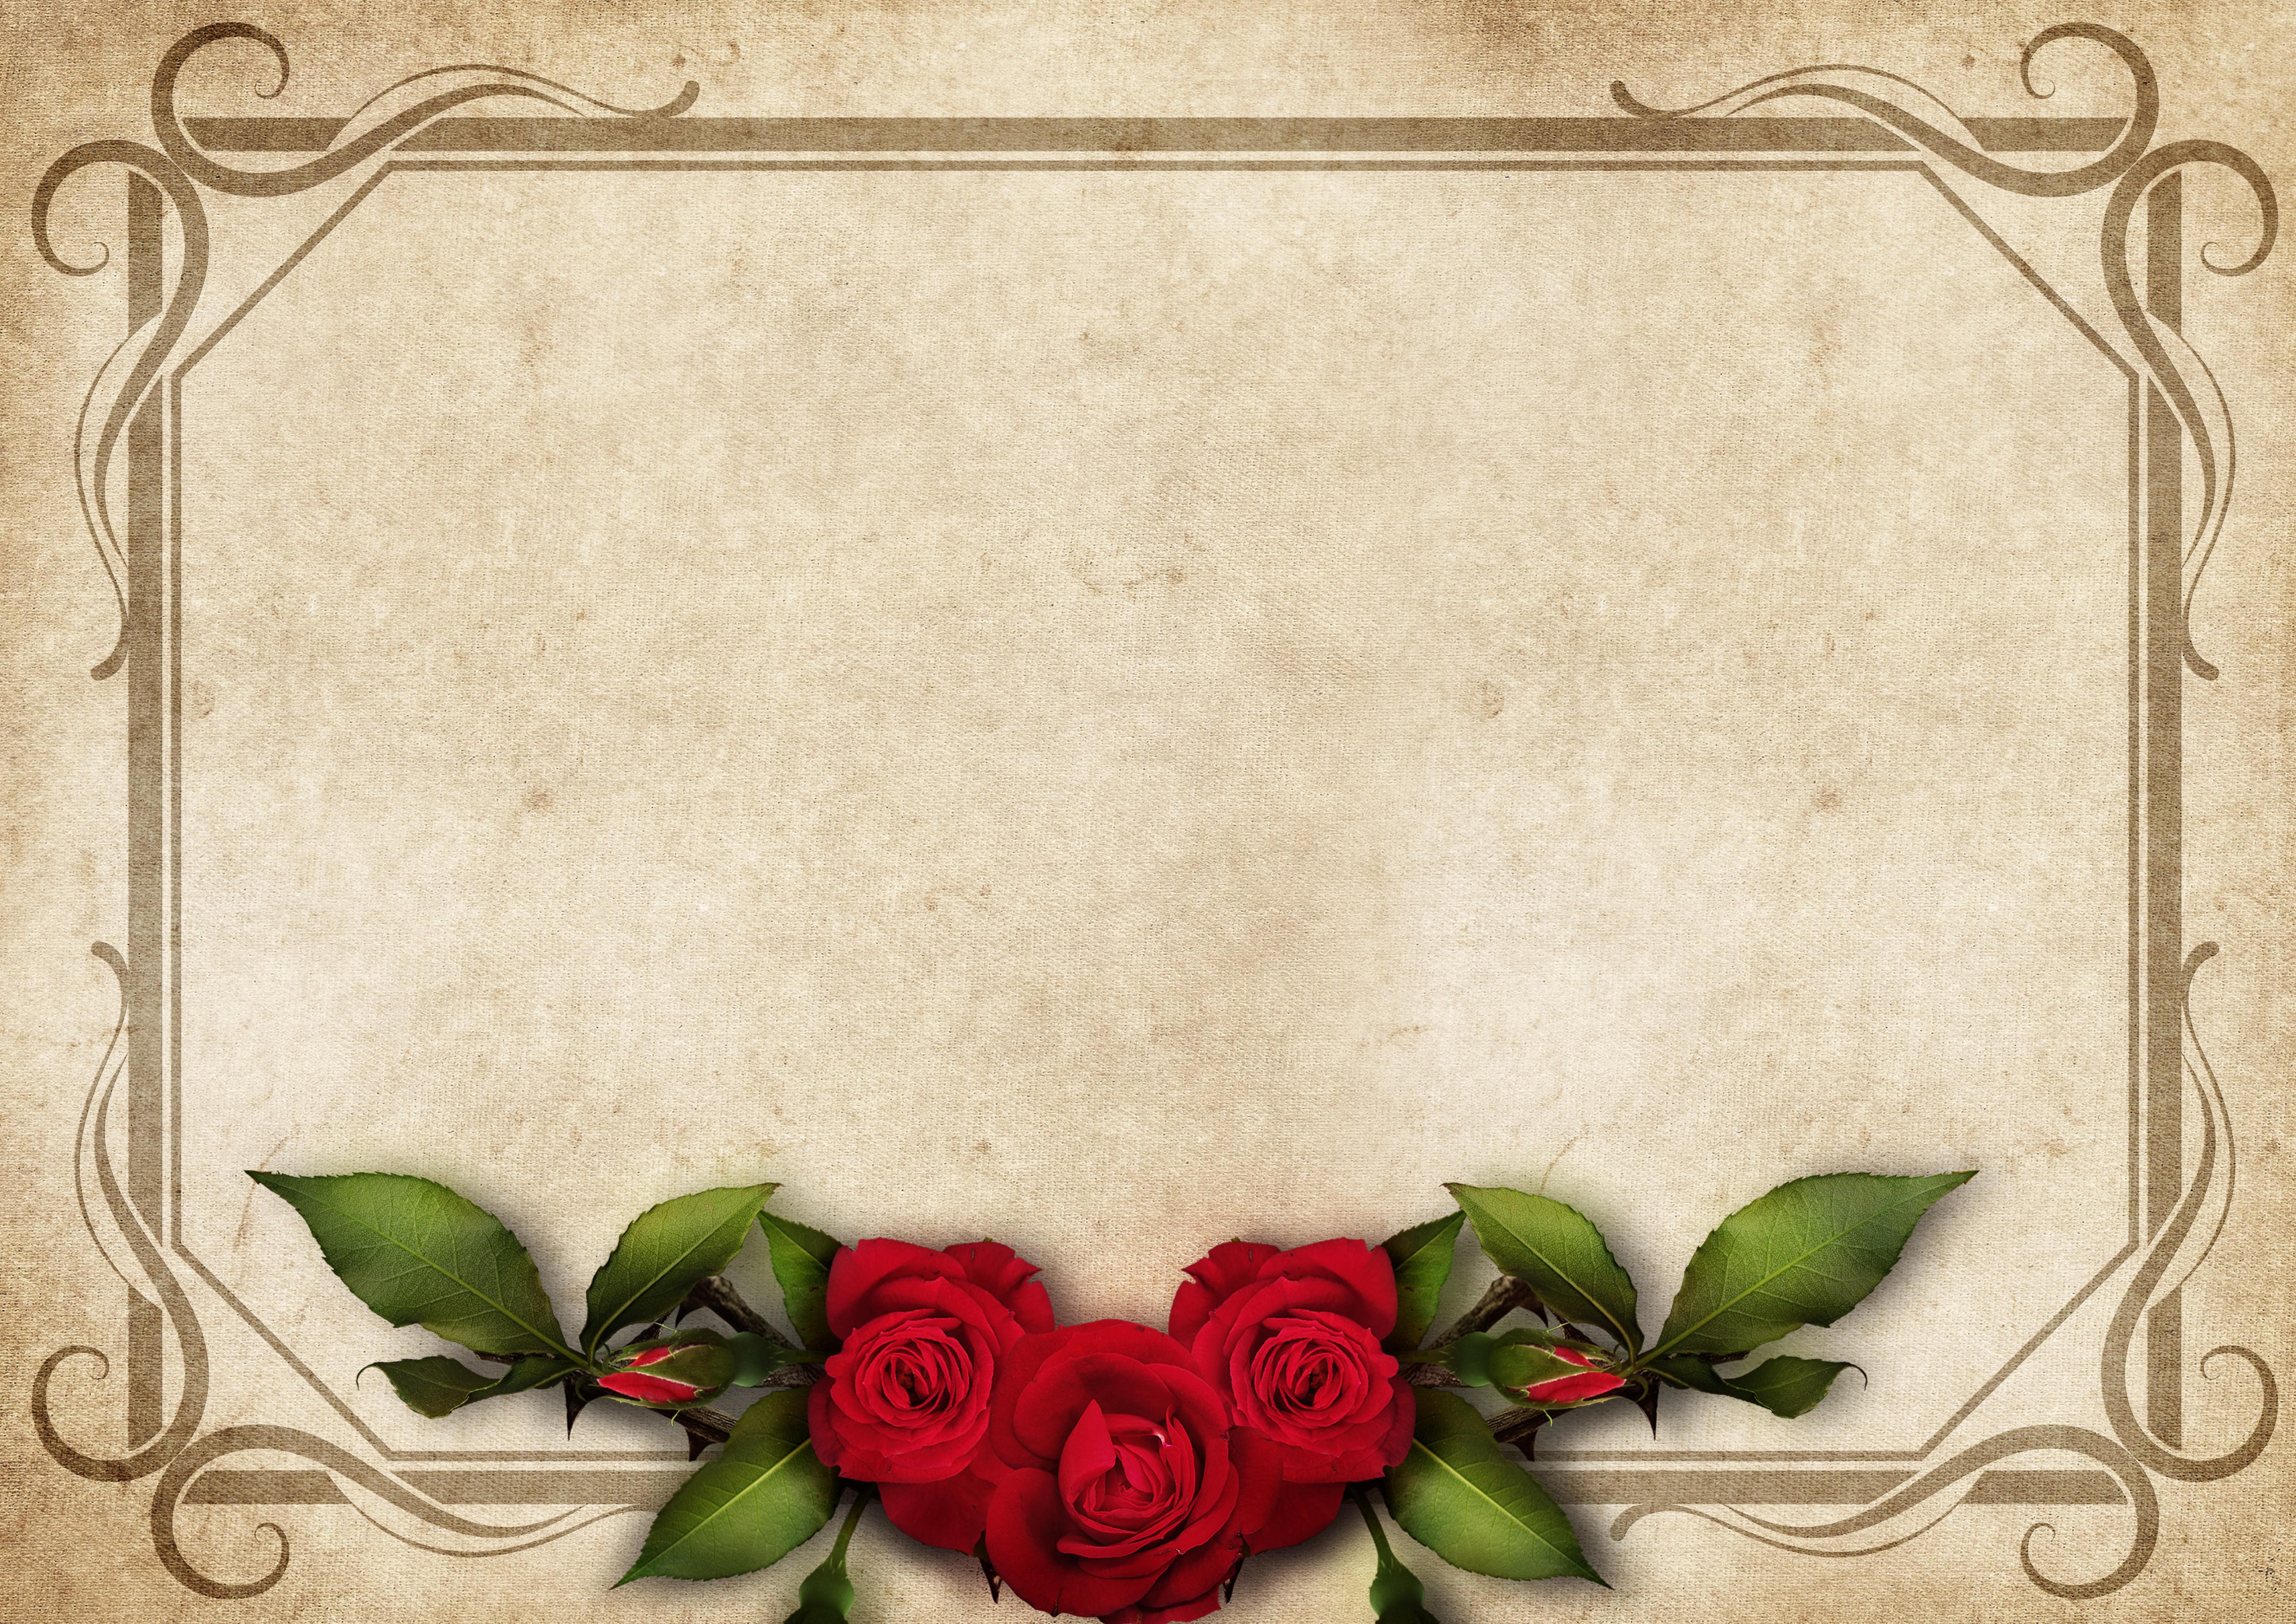 660 Gambar Bingkai Foto Romantis HD Terbaik